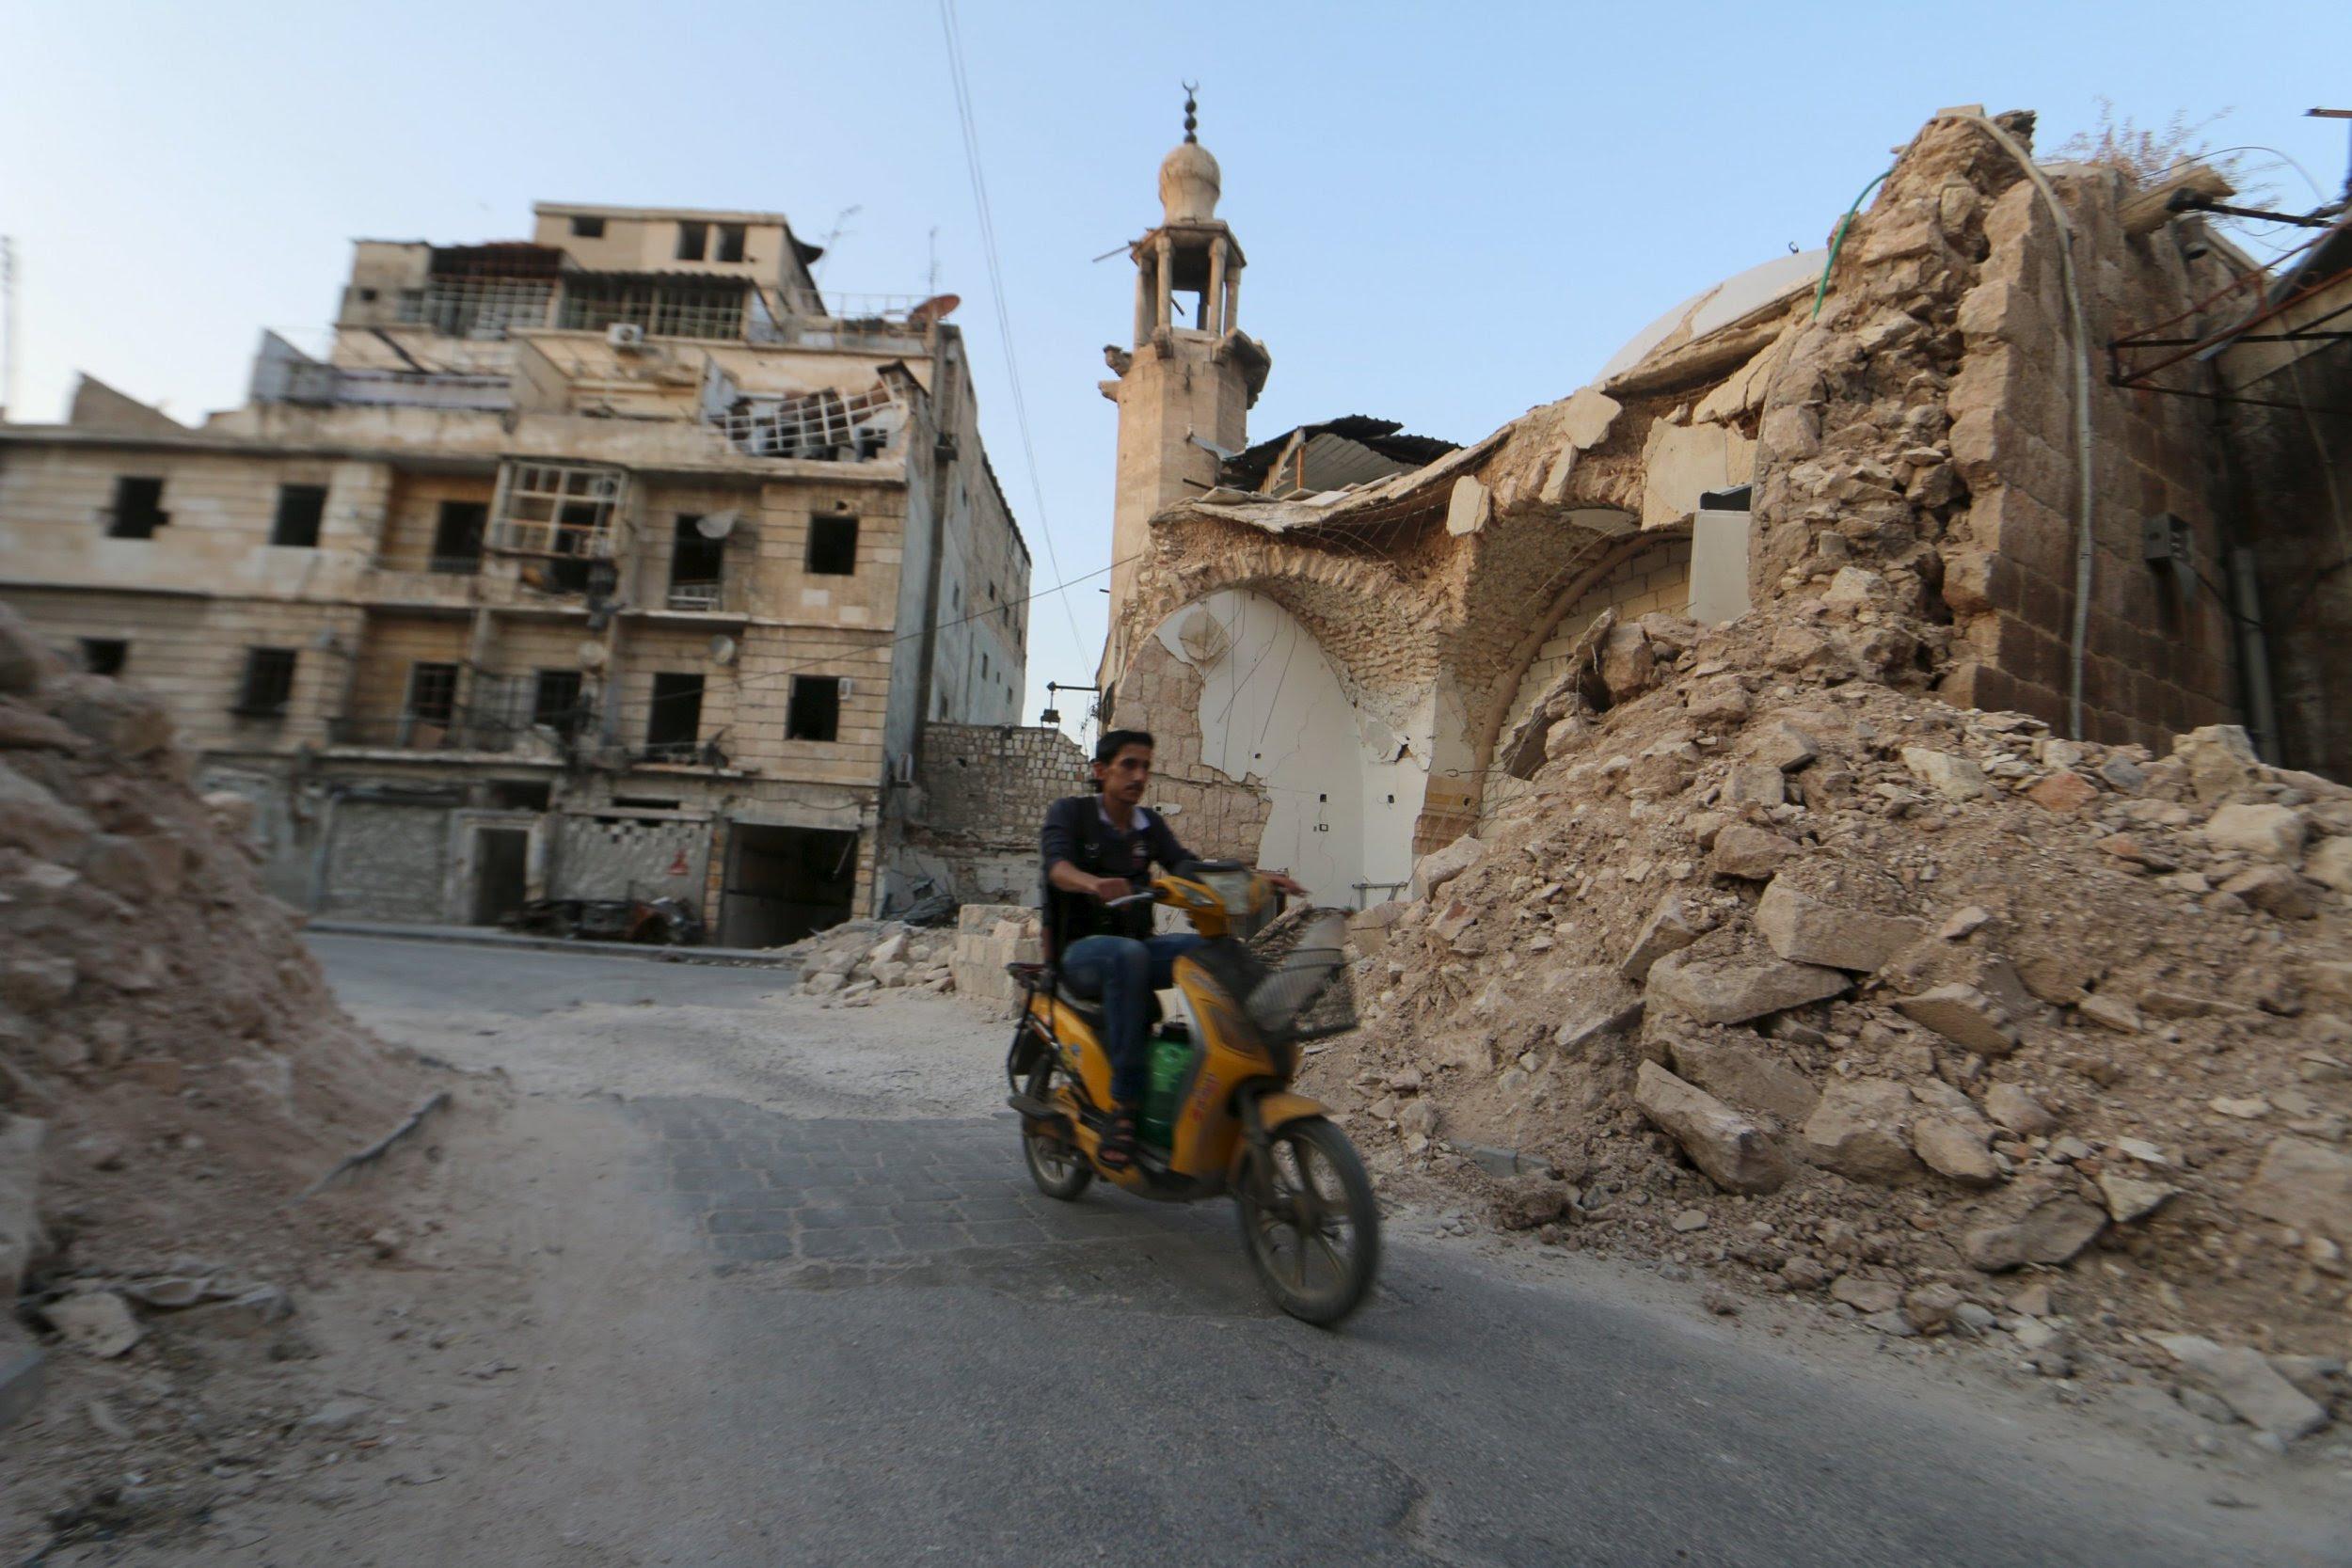 2015-07-15T195119Z_1924653176_GF10000160147_RTRMADP_3_MIDEAST-CRISIS-SYRIA